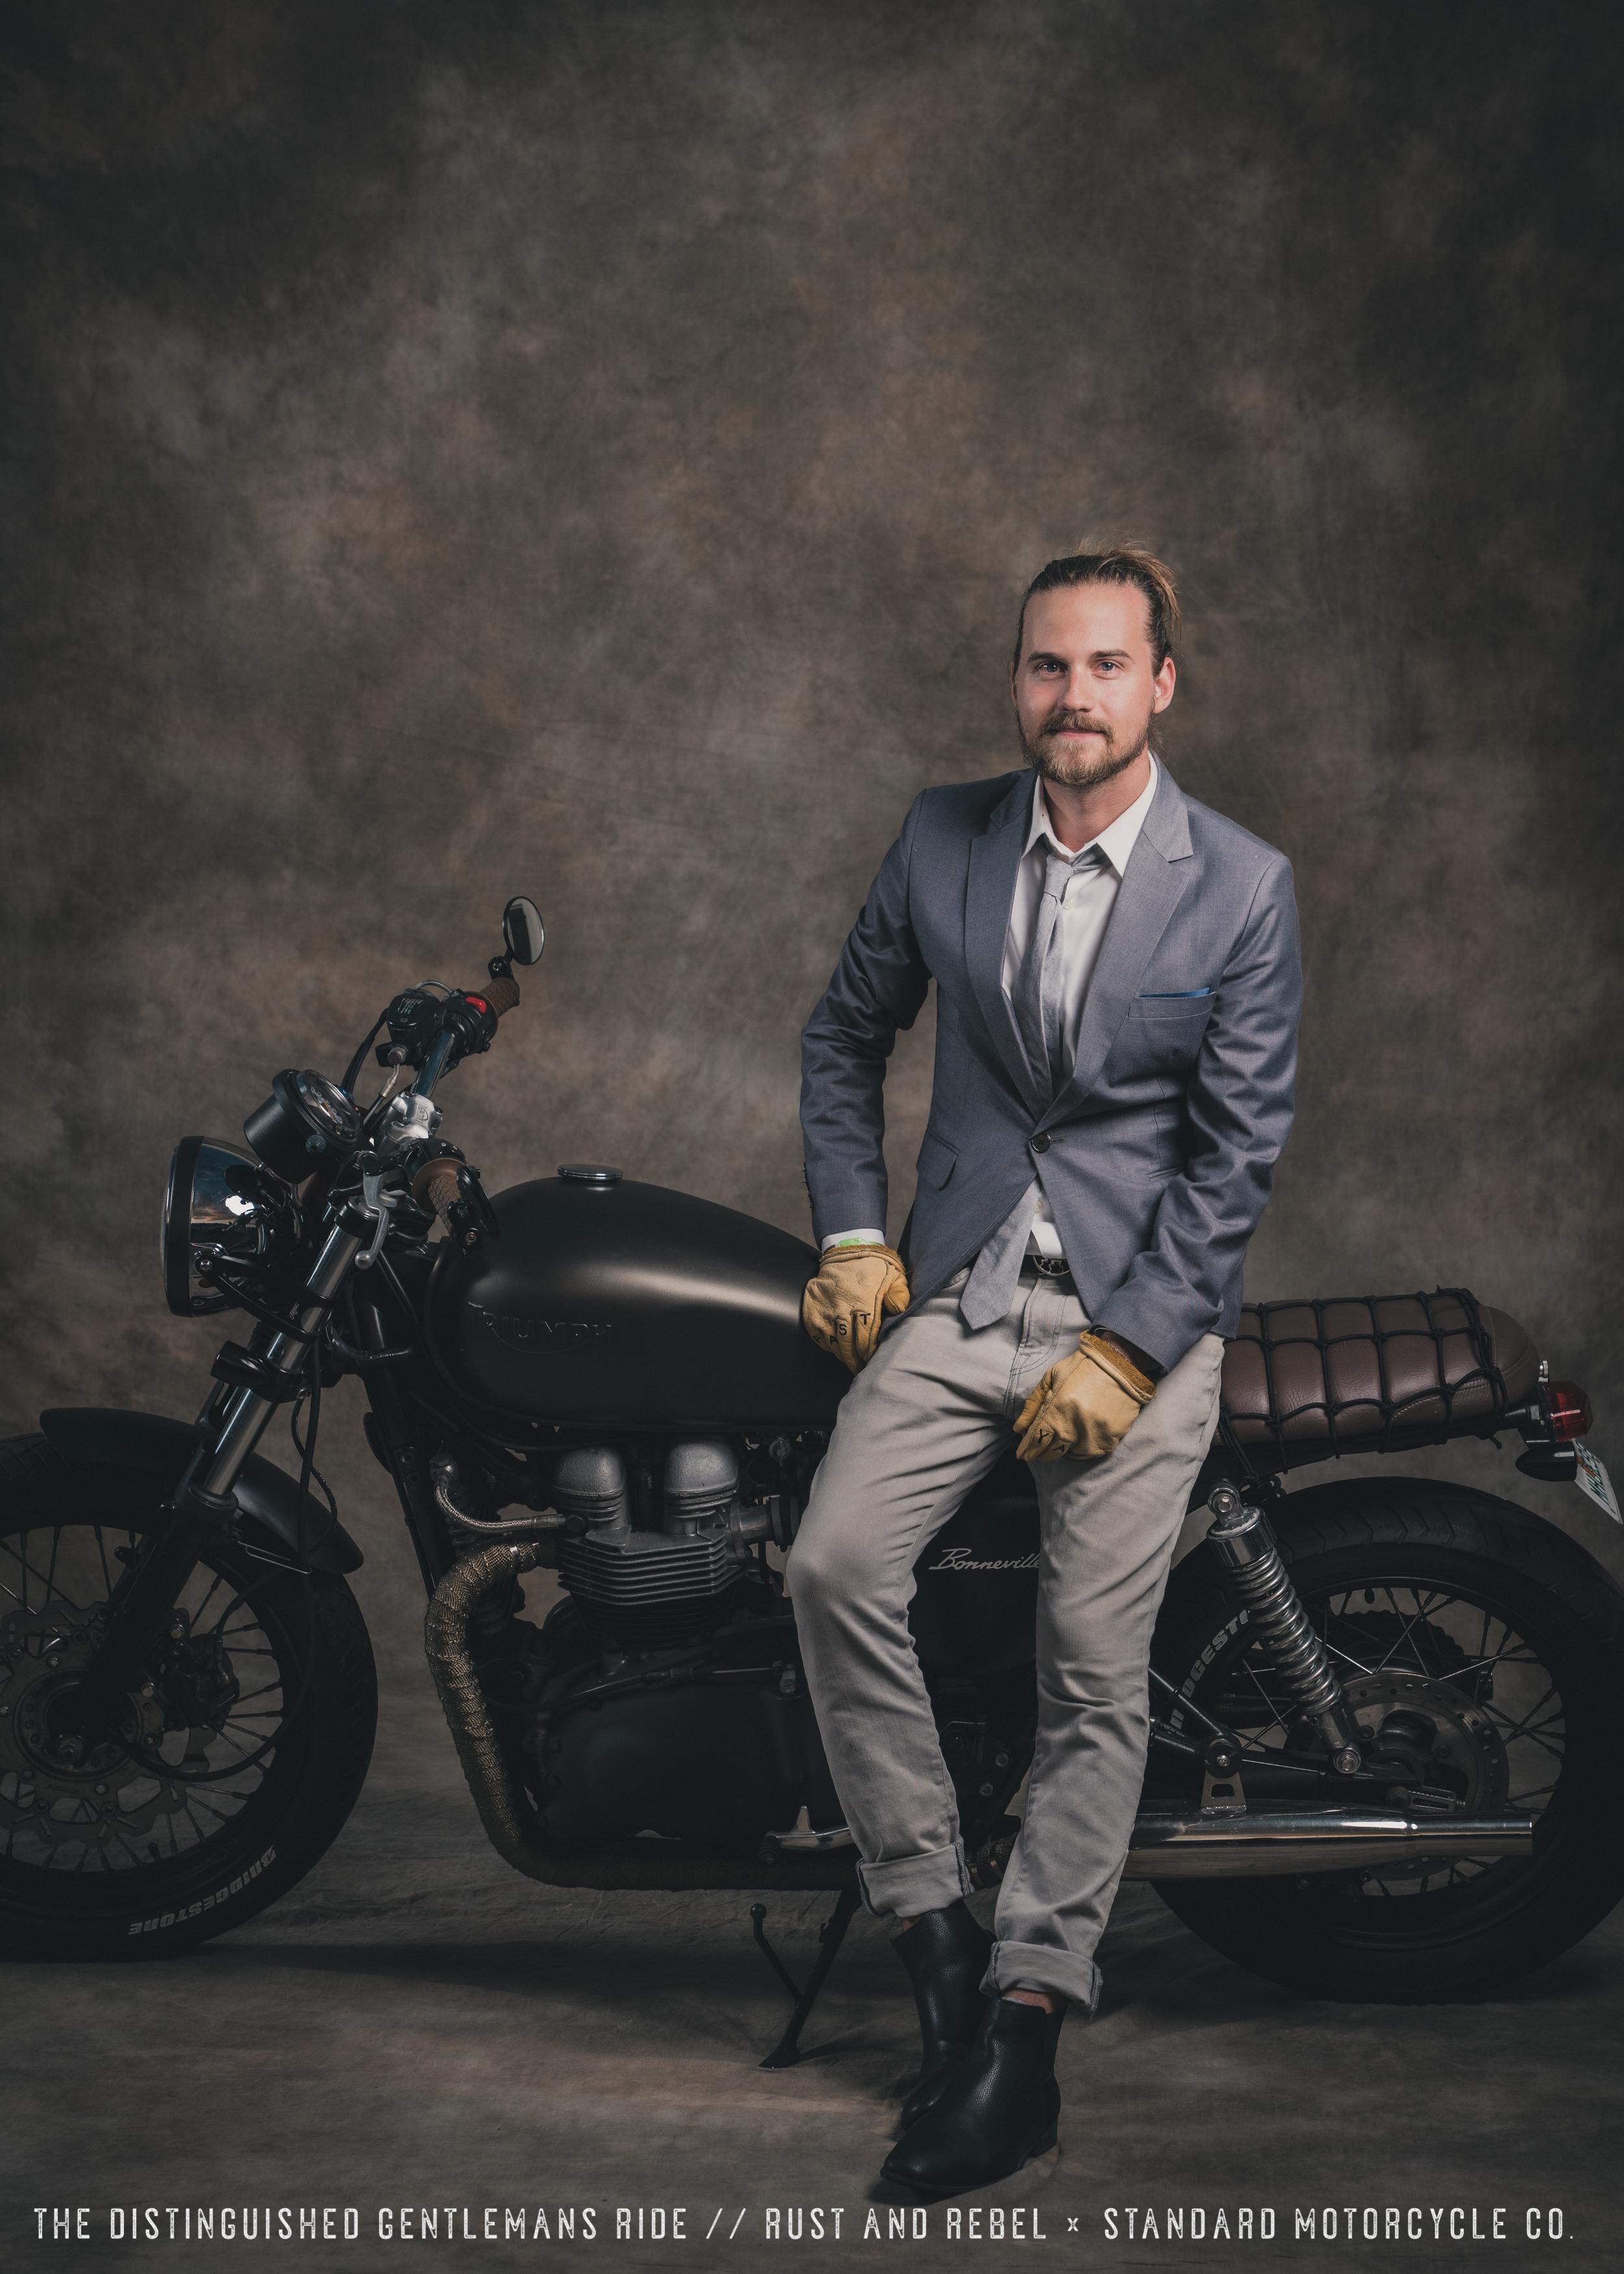 The Distinguished Gentleman's Ride 2019 [PEOPLE - PHOTO BY @MIKEDUNNUSA] - 0145.jpg